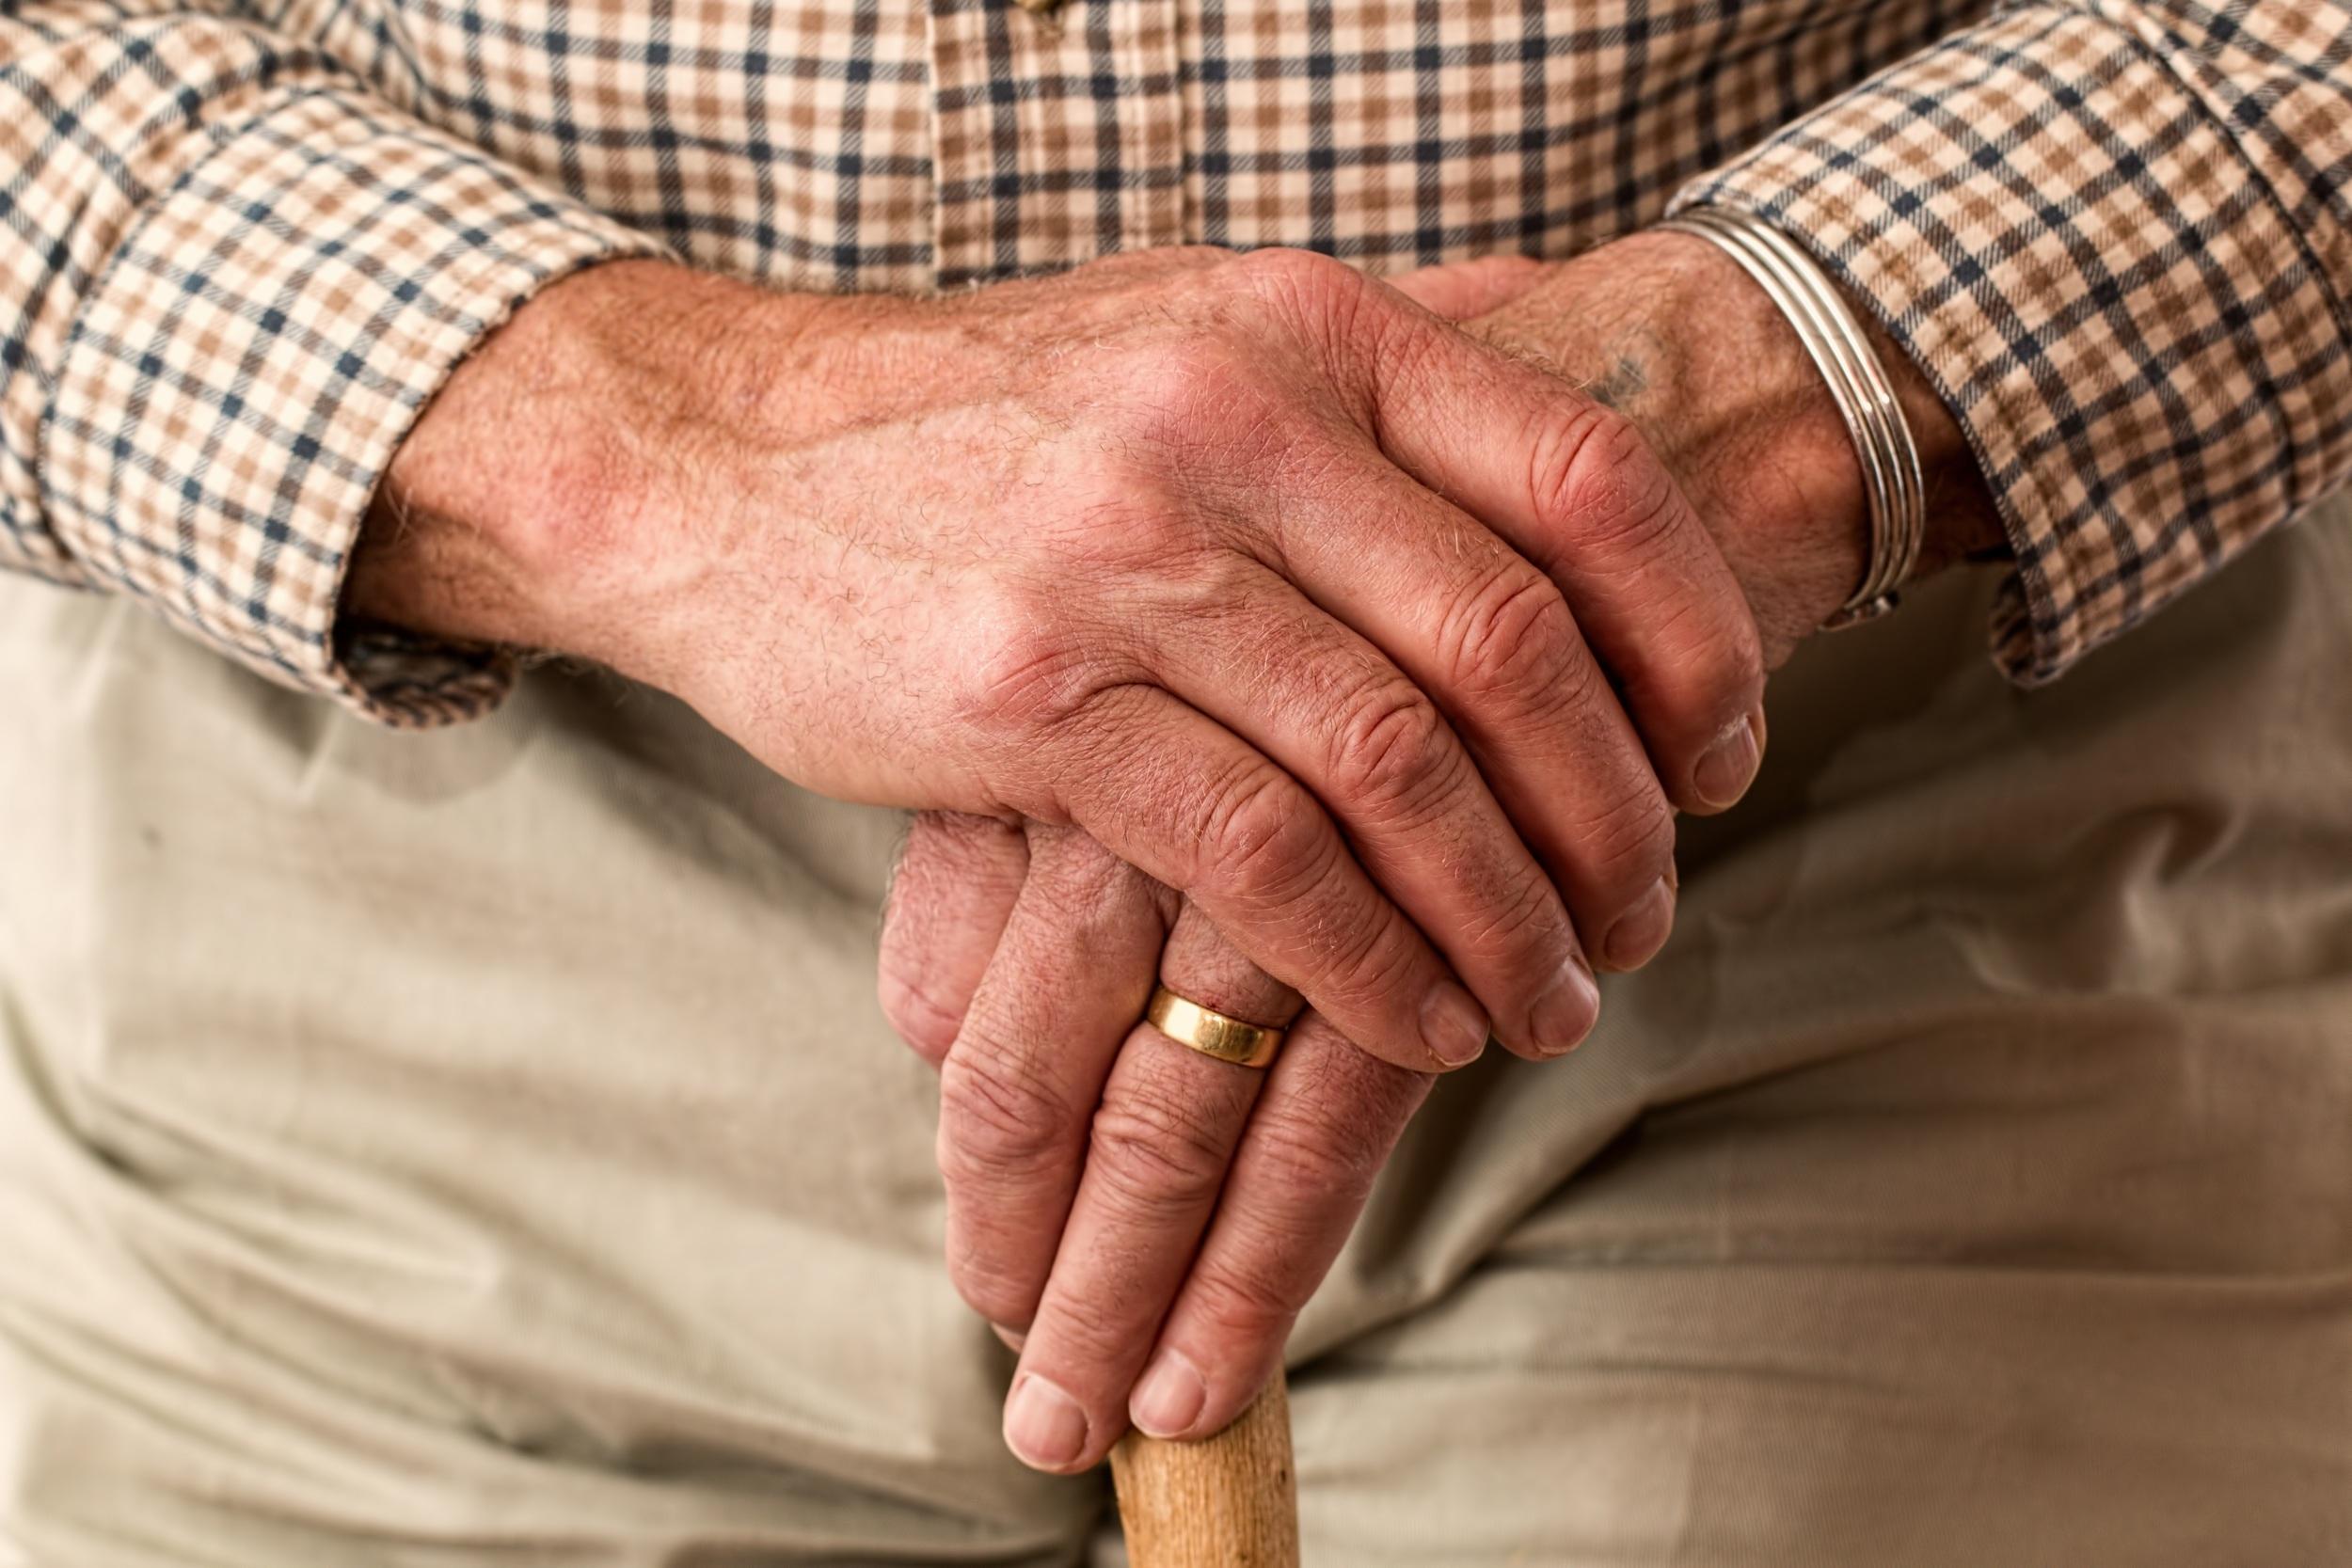 Hands of older man holding a cane